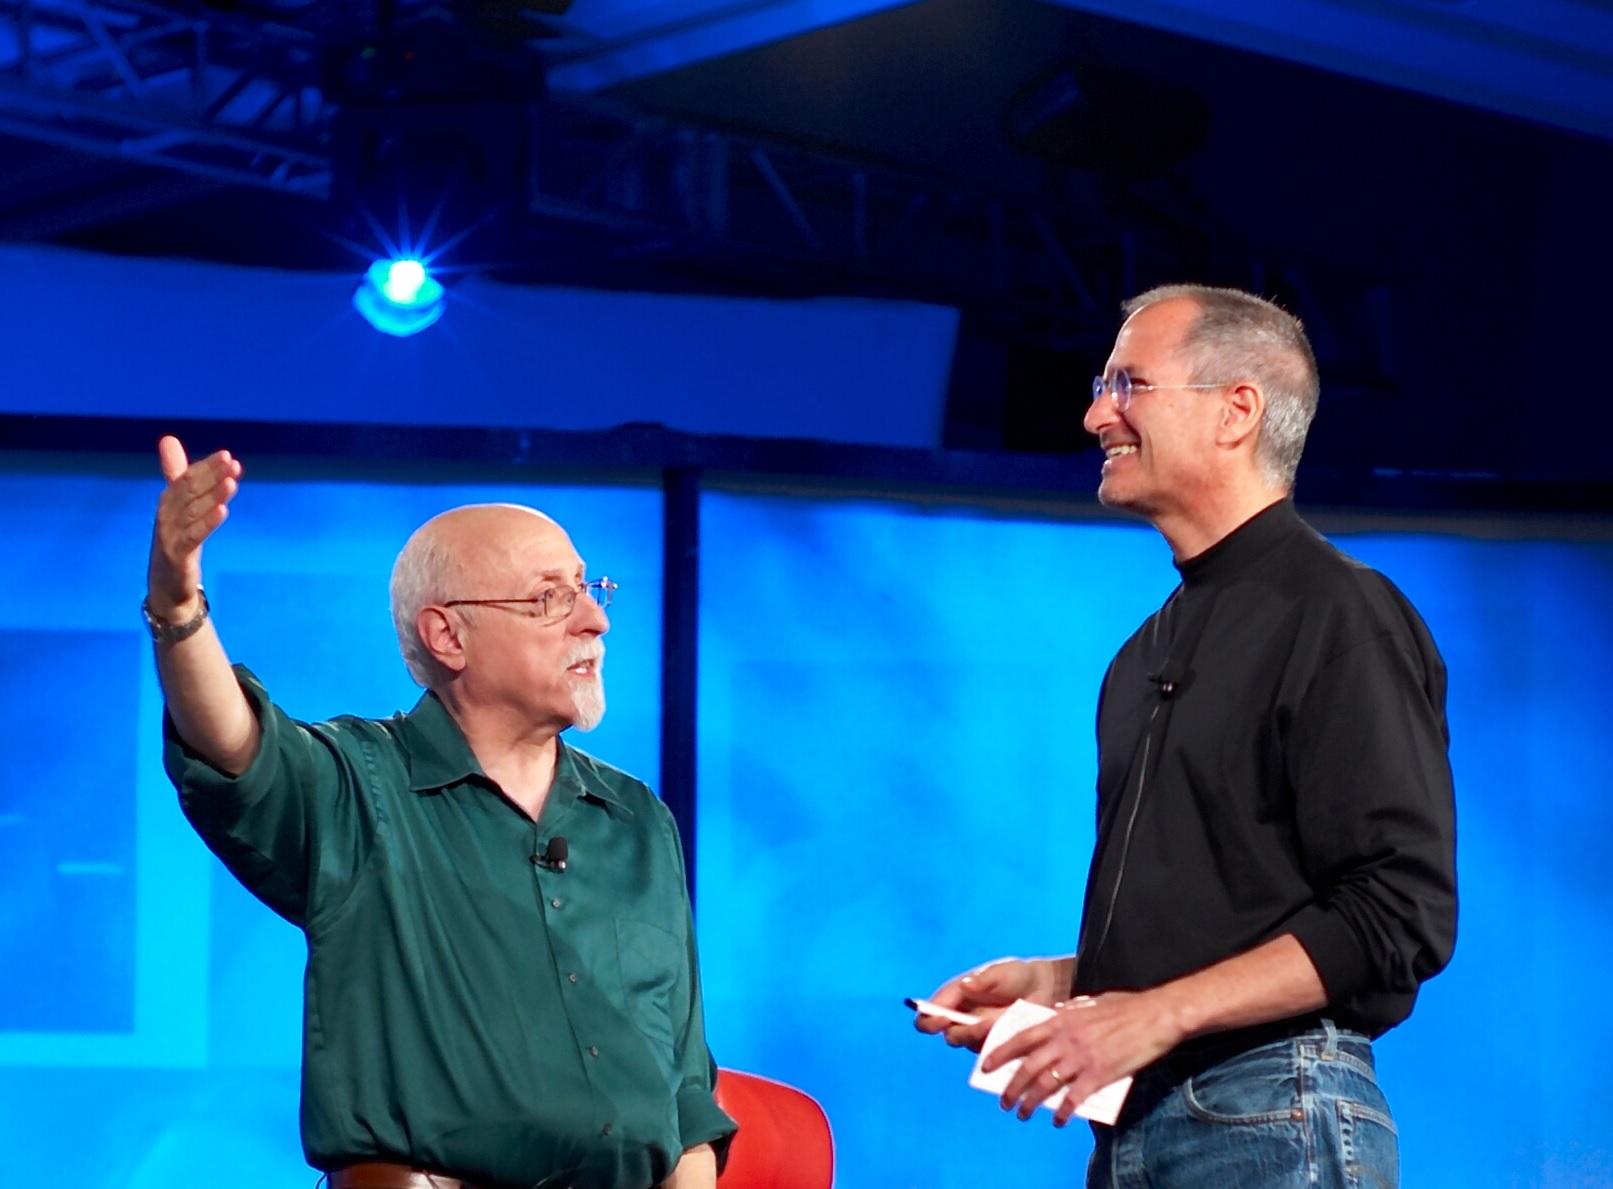 Steve Jobs Walt Mossberg